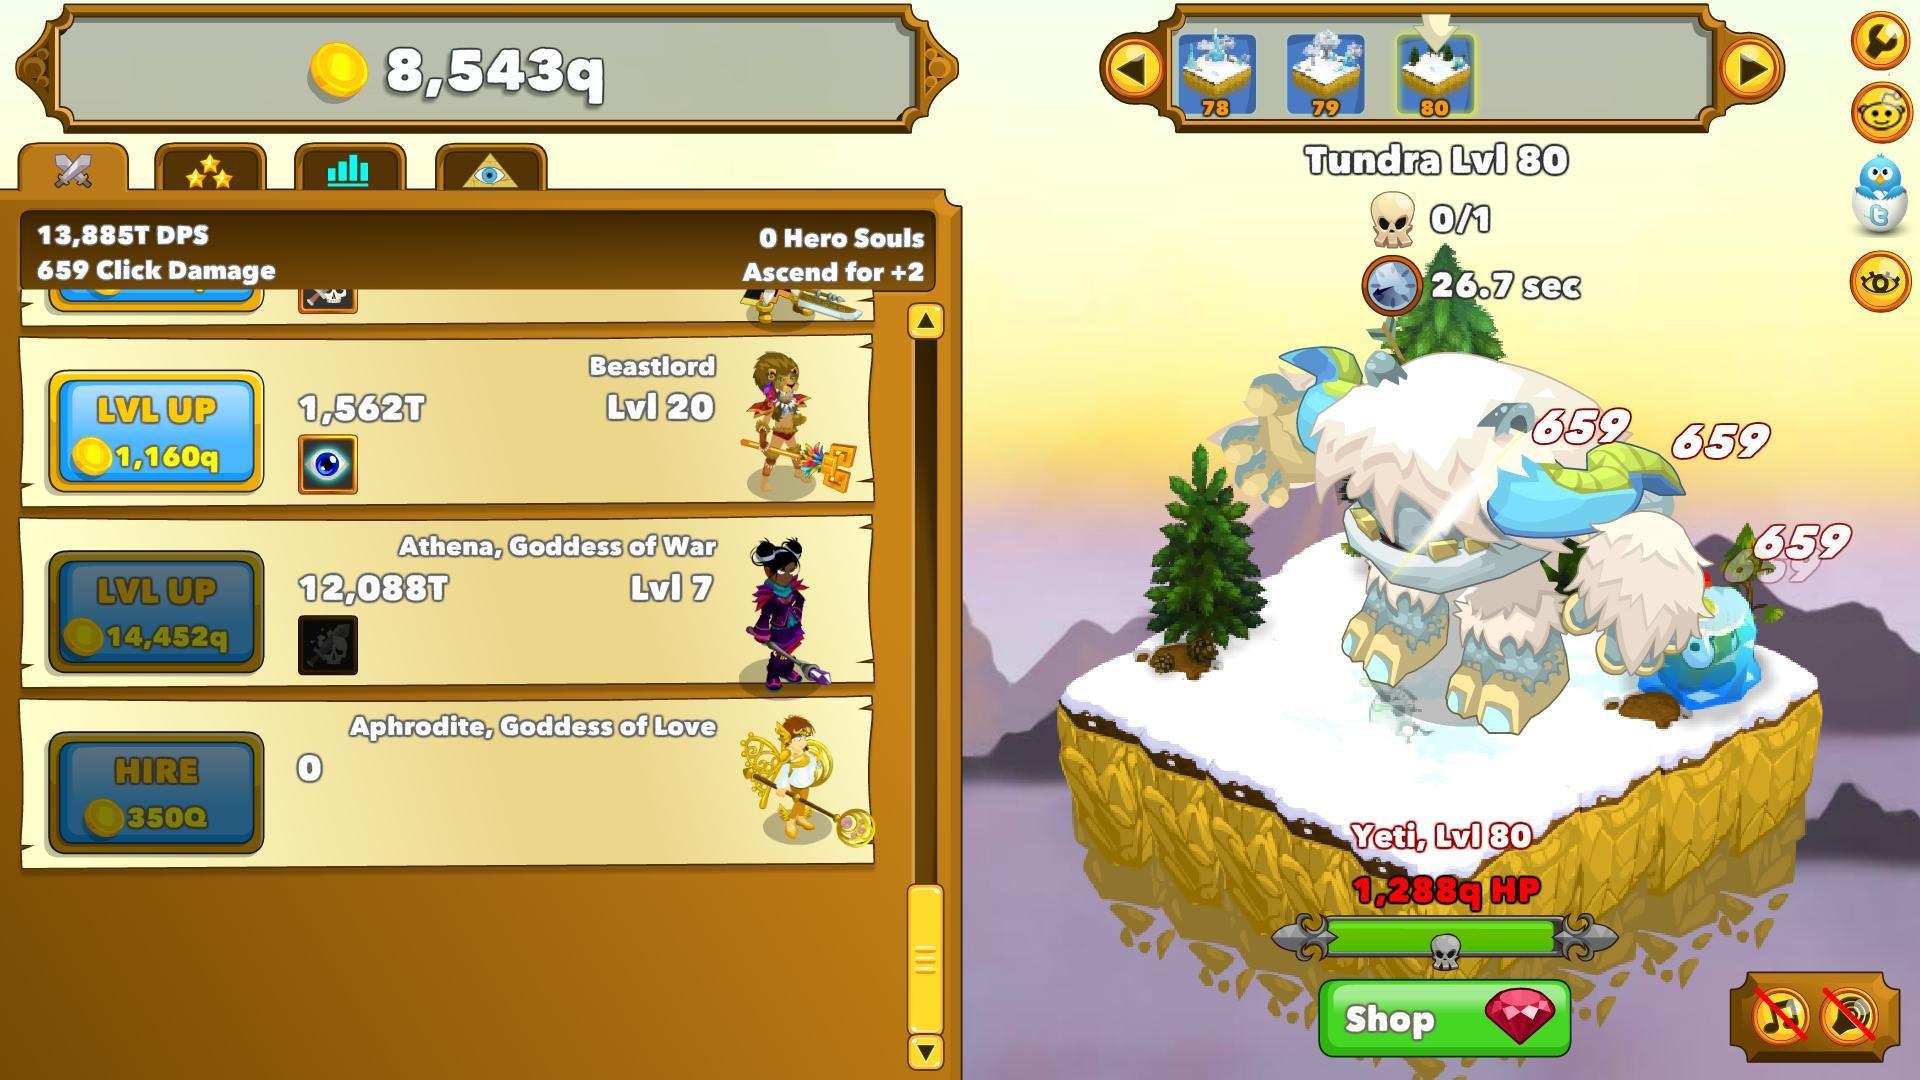 clicker games download pc